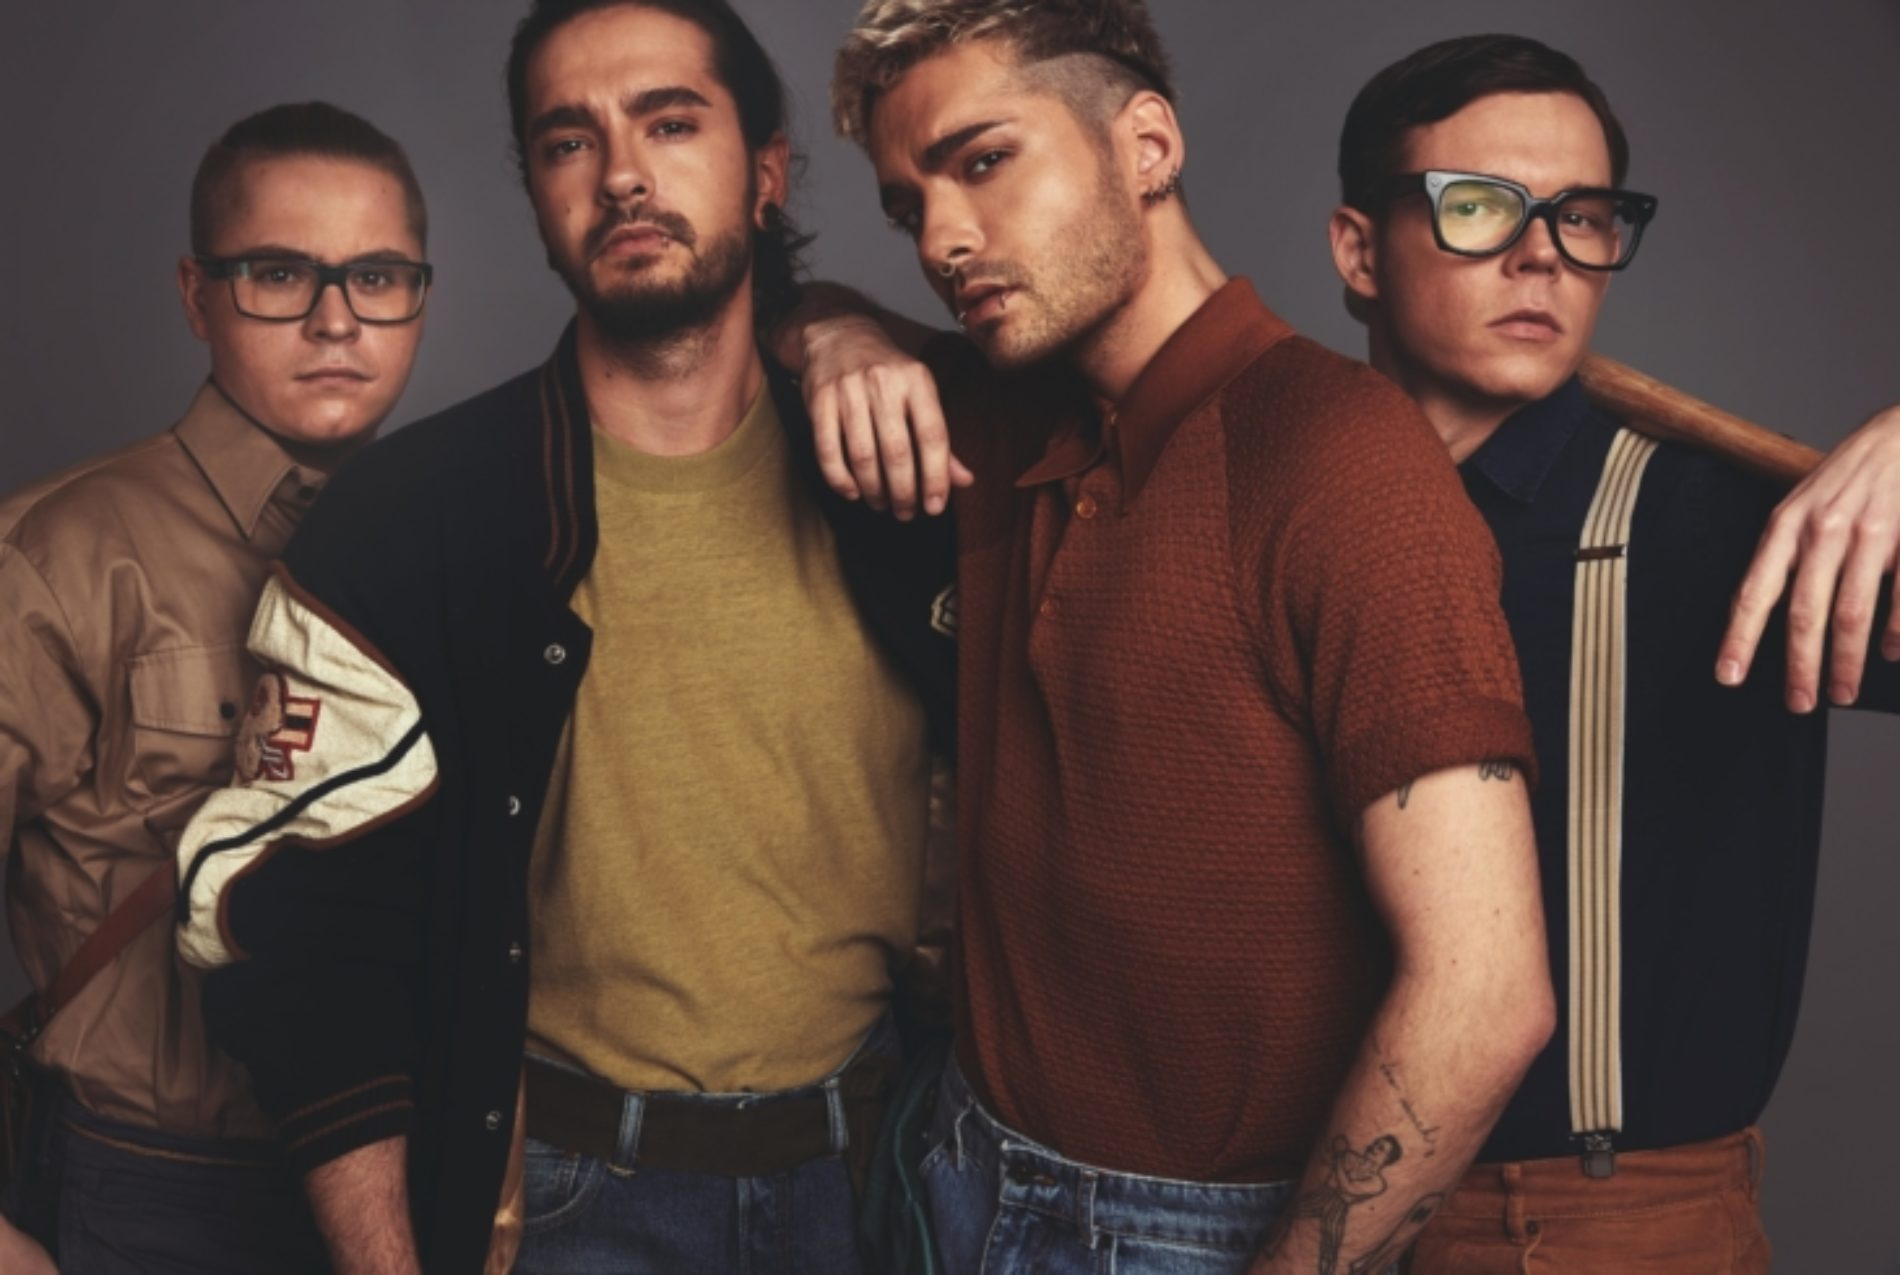 Tokio Hotel – Whent It Rains It Pours